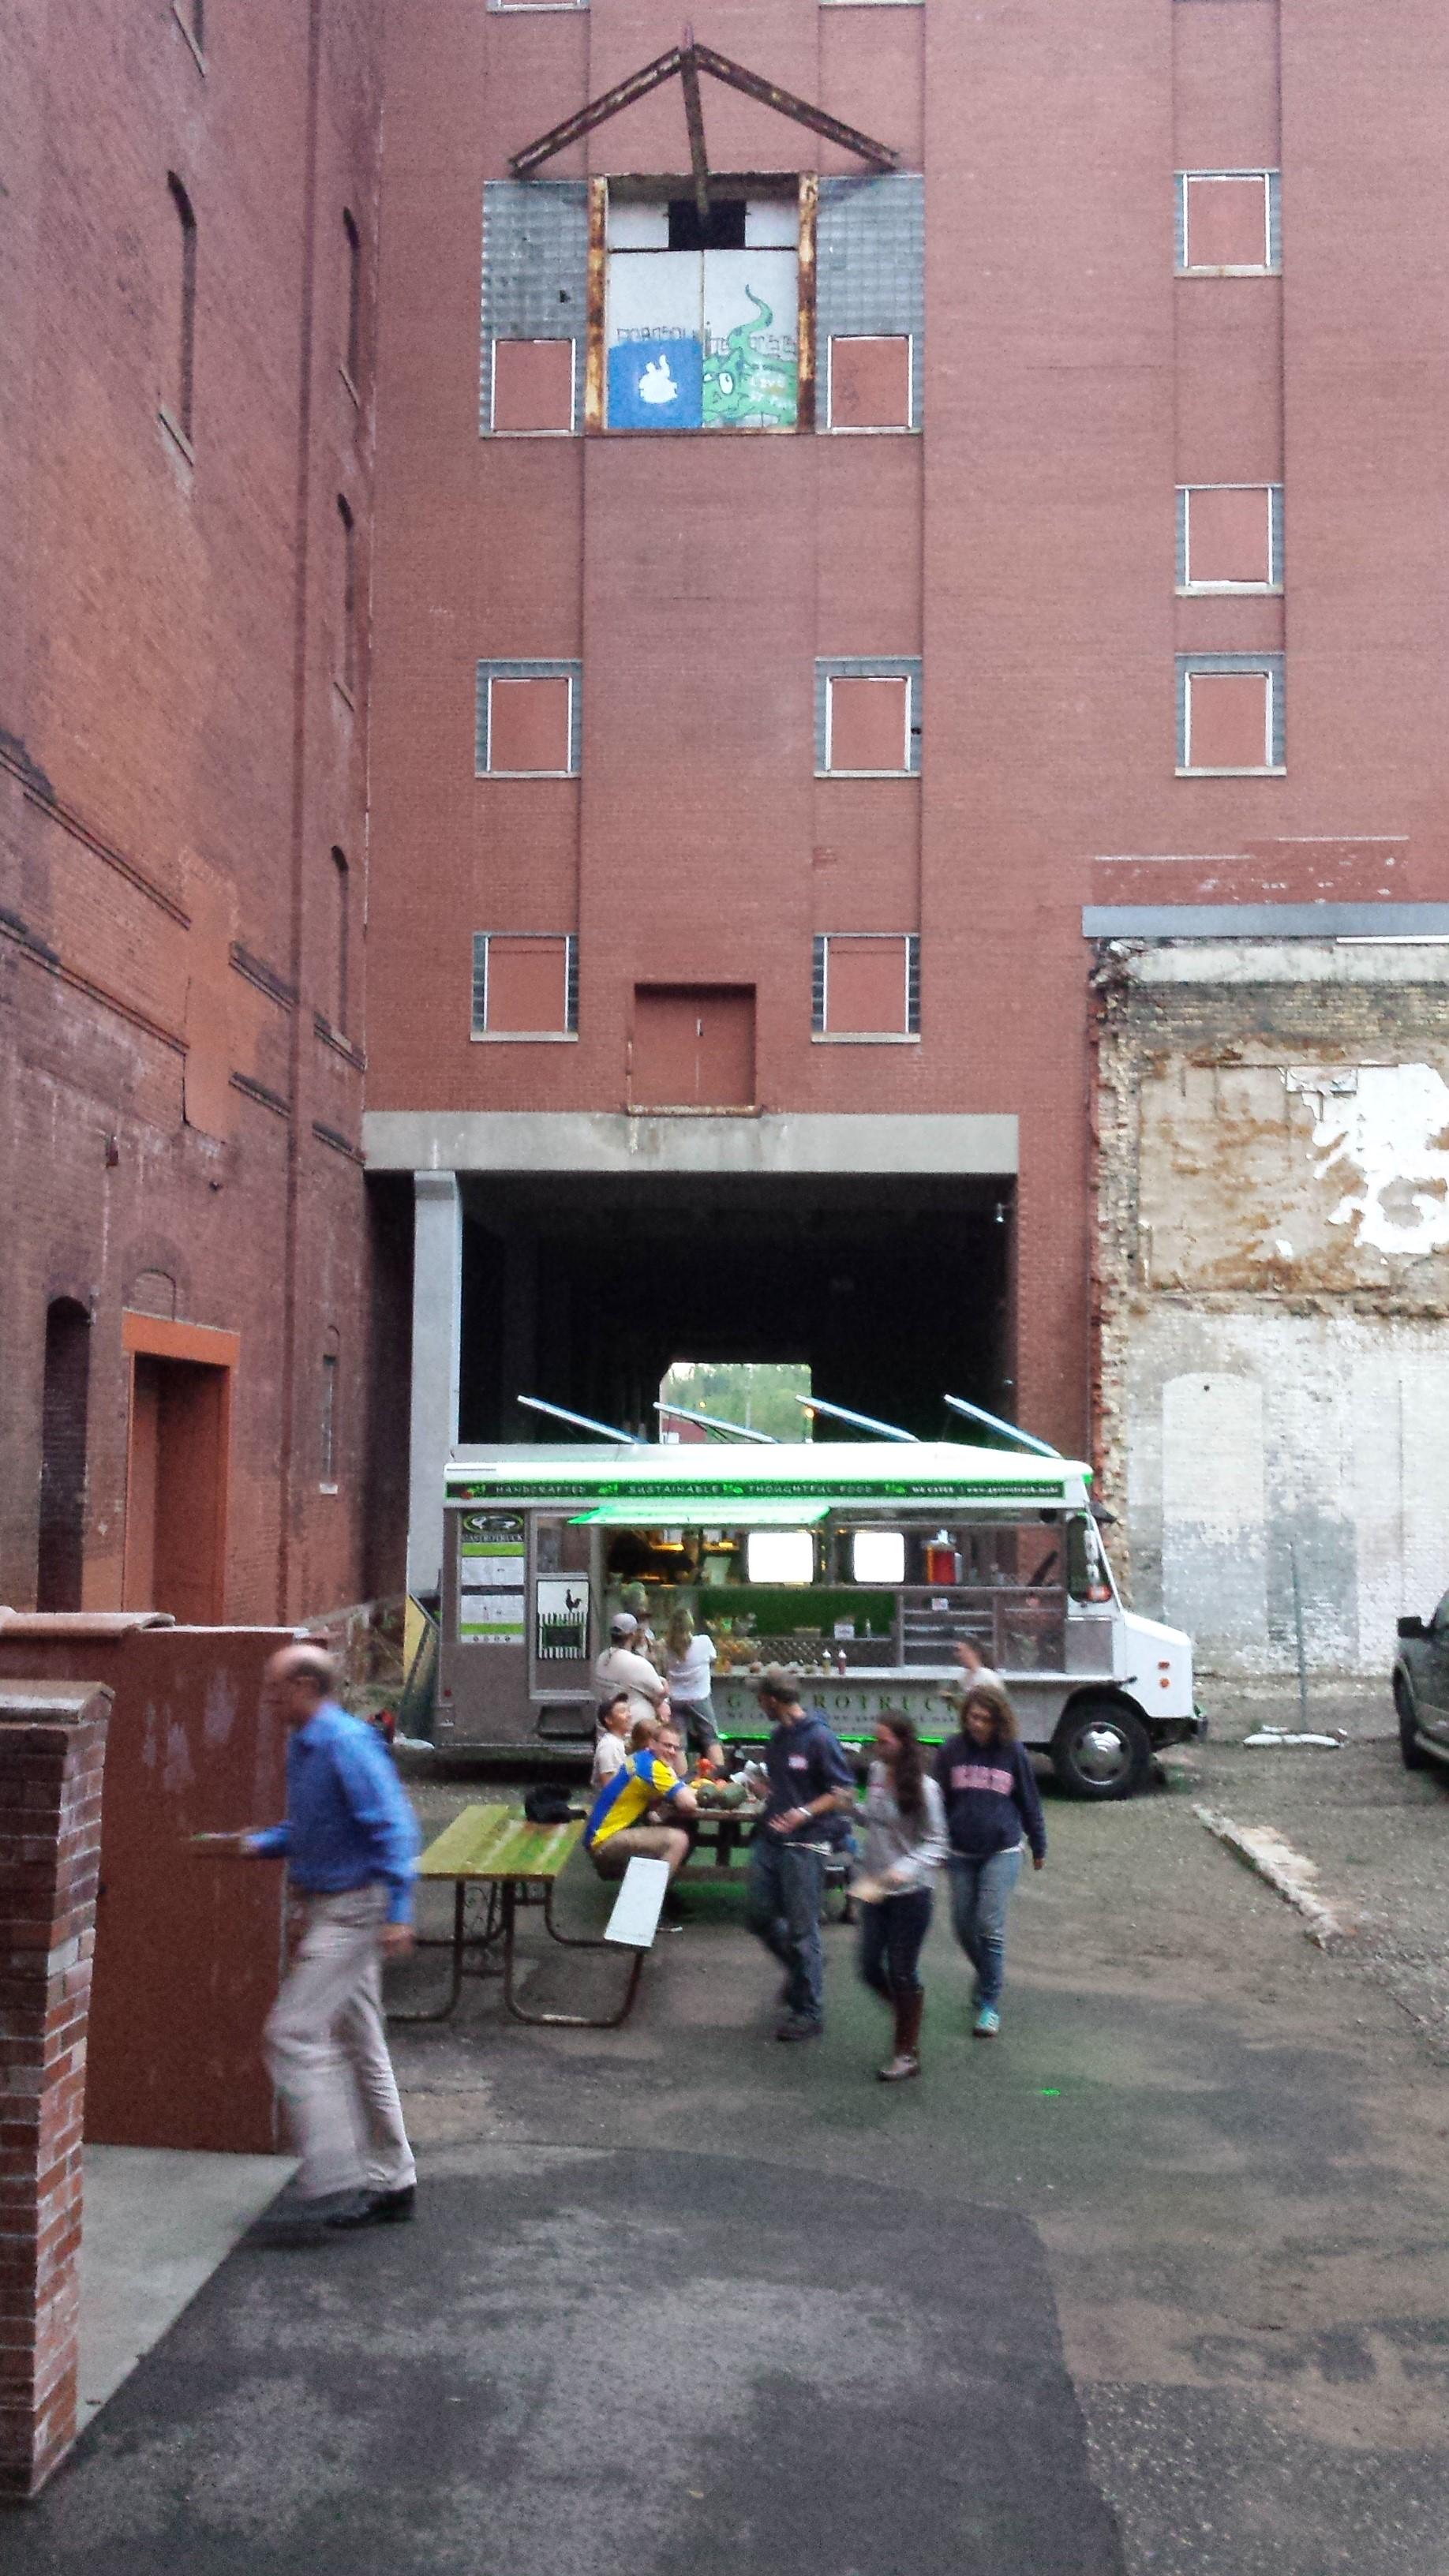 Flat-earth-brewery-MN-food-truck.jpg